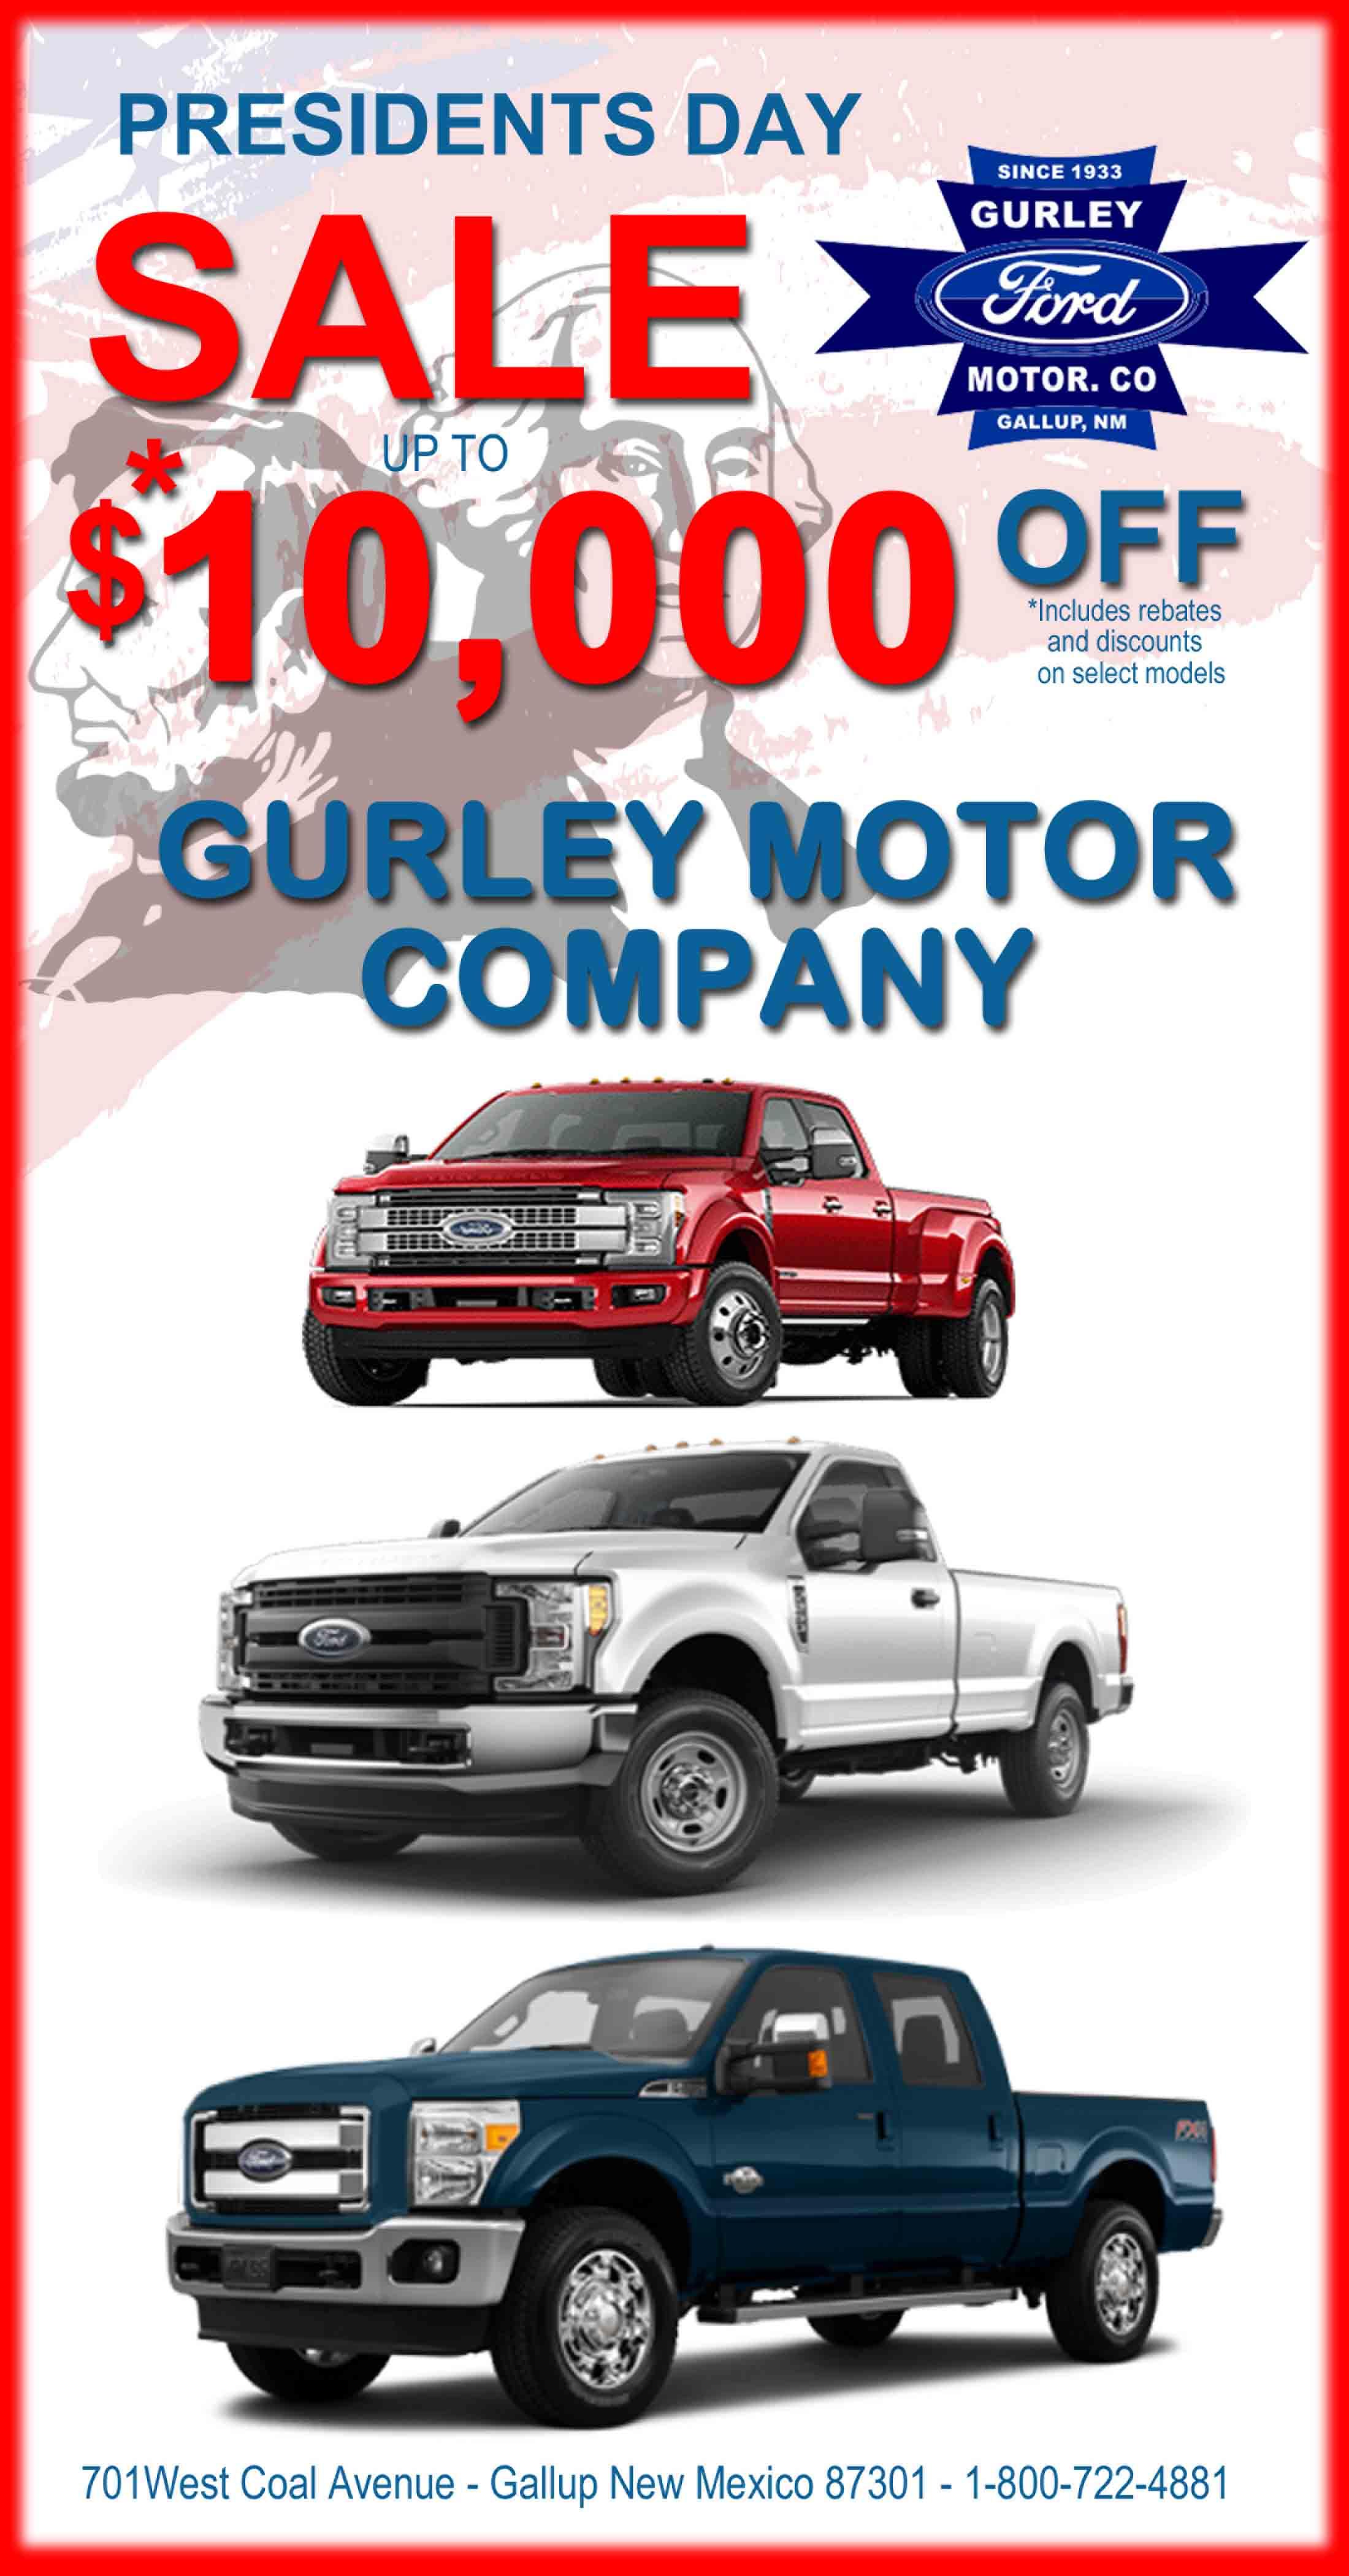 2017 Gurley Motor Co President 39 S Day Sale: gurley motor